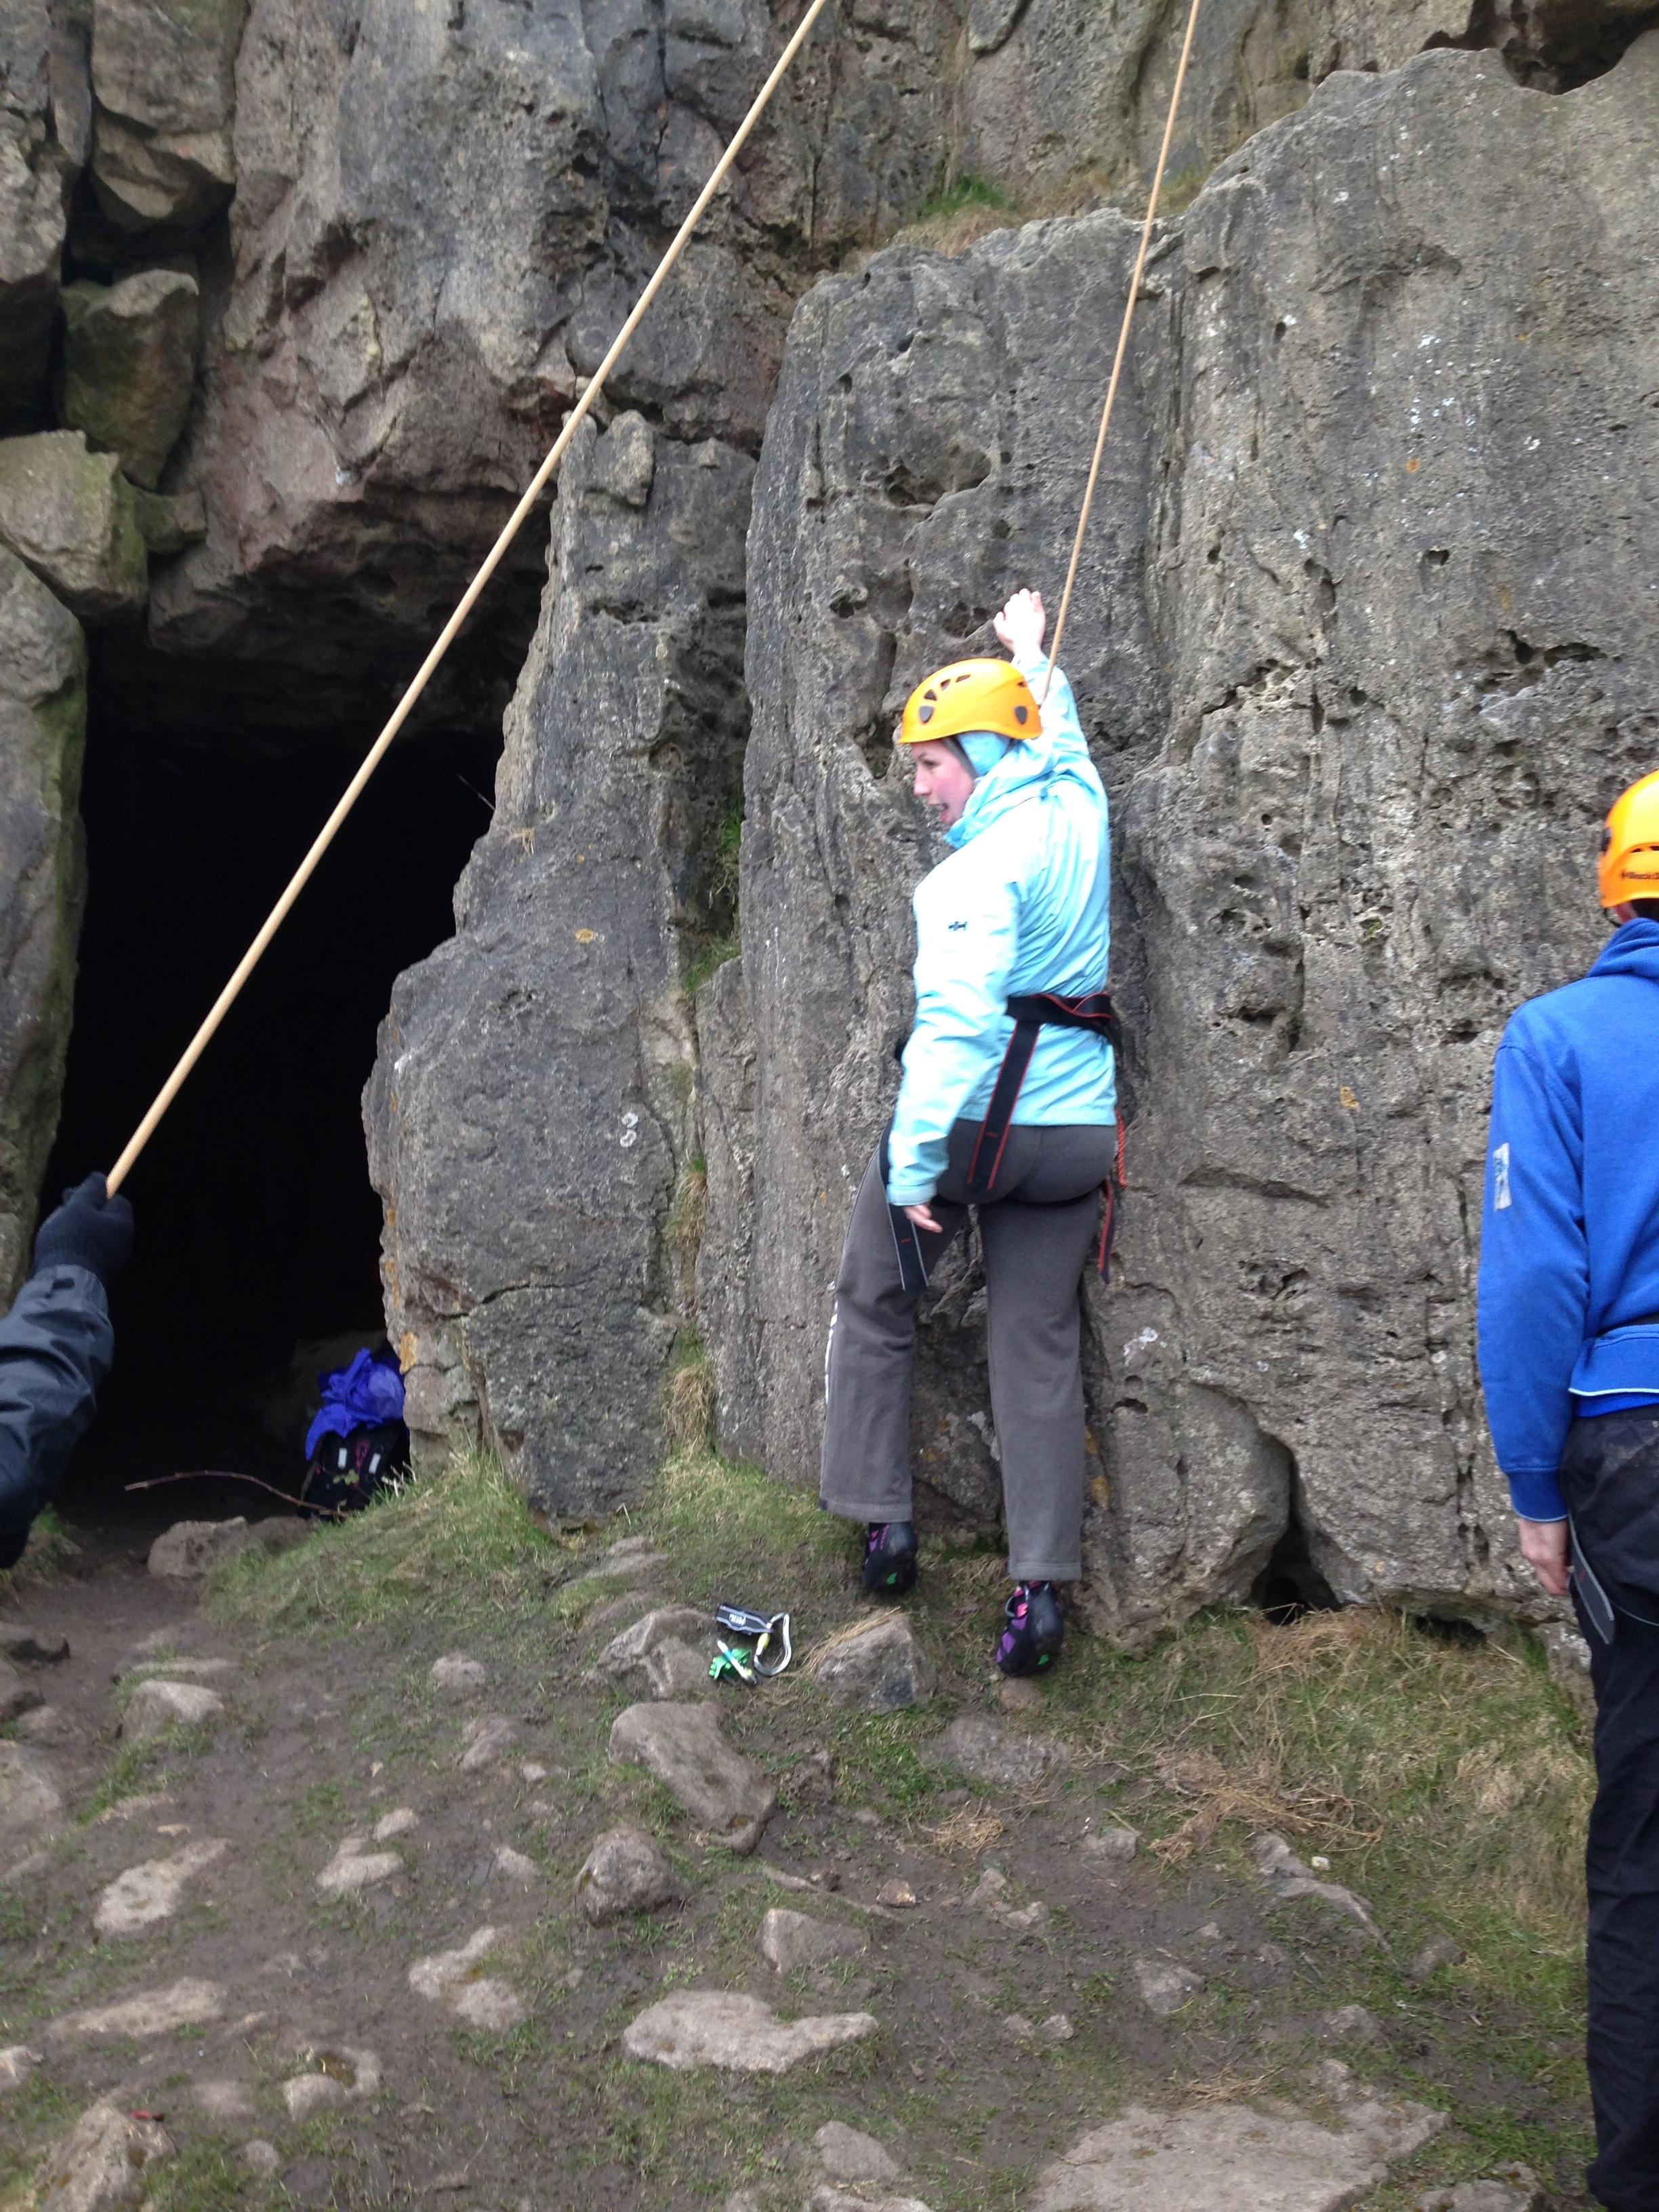 Climbing at Harborough Rocks